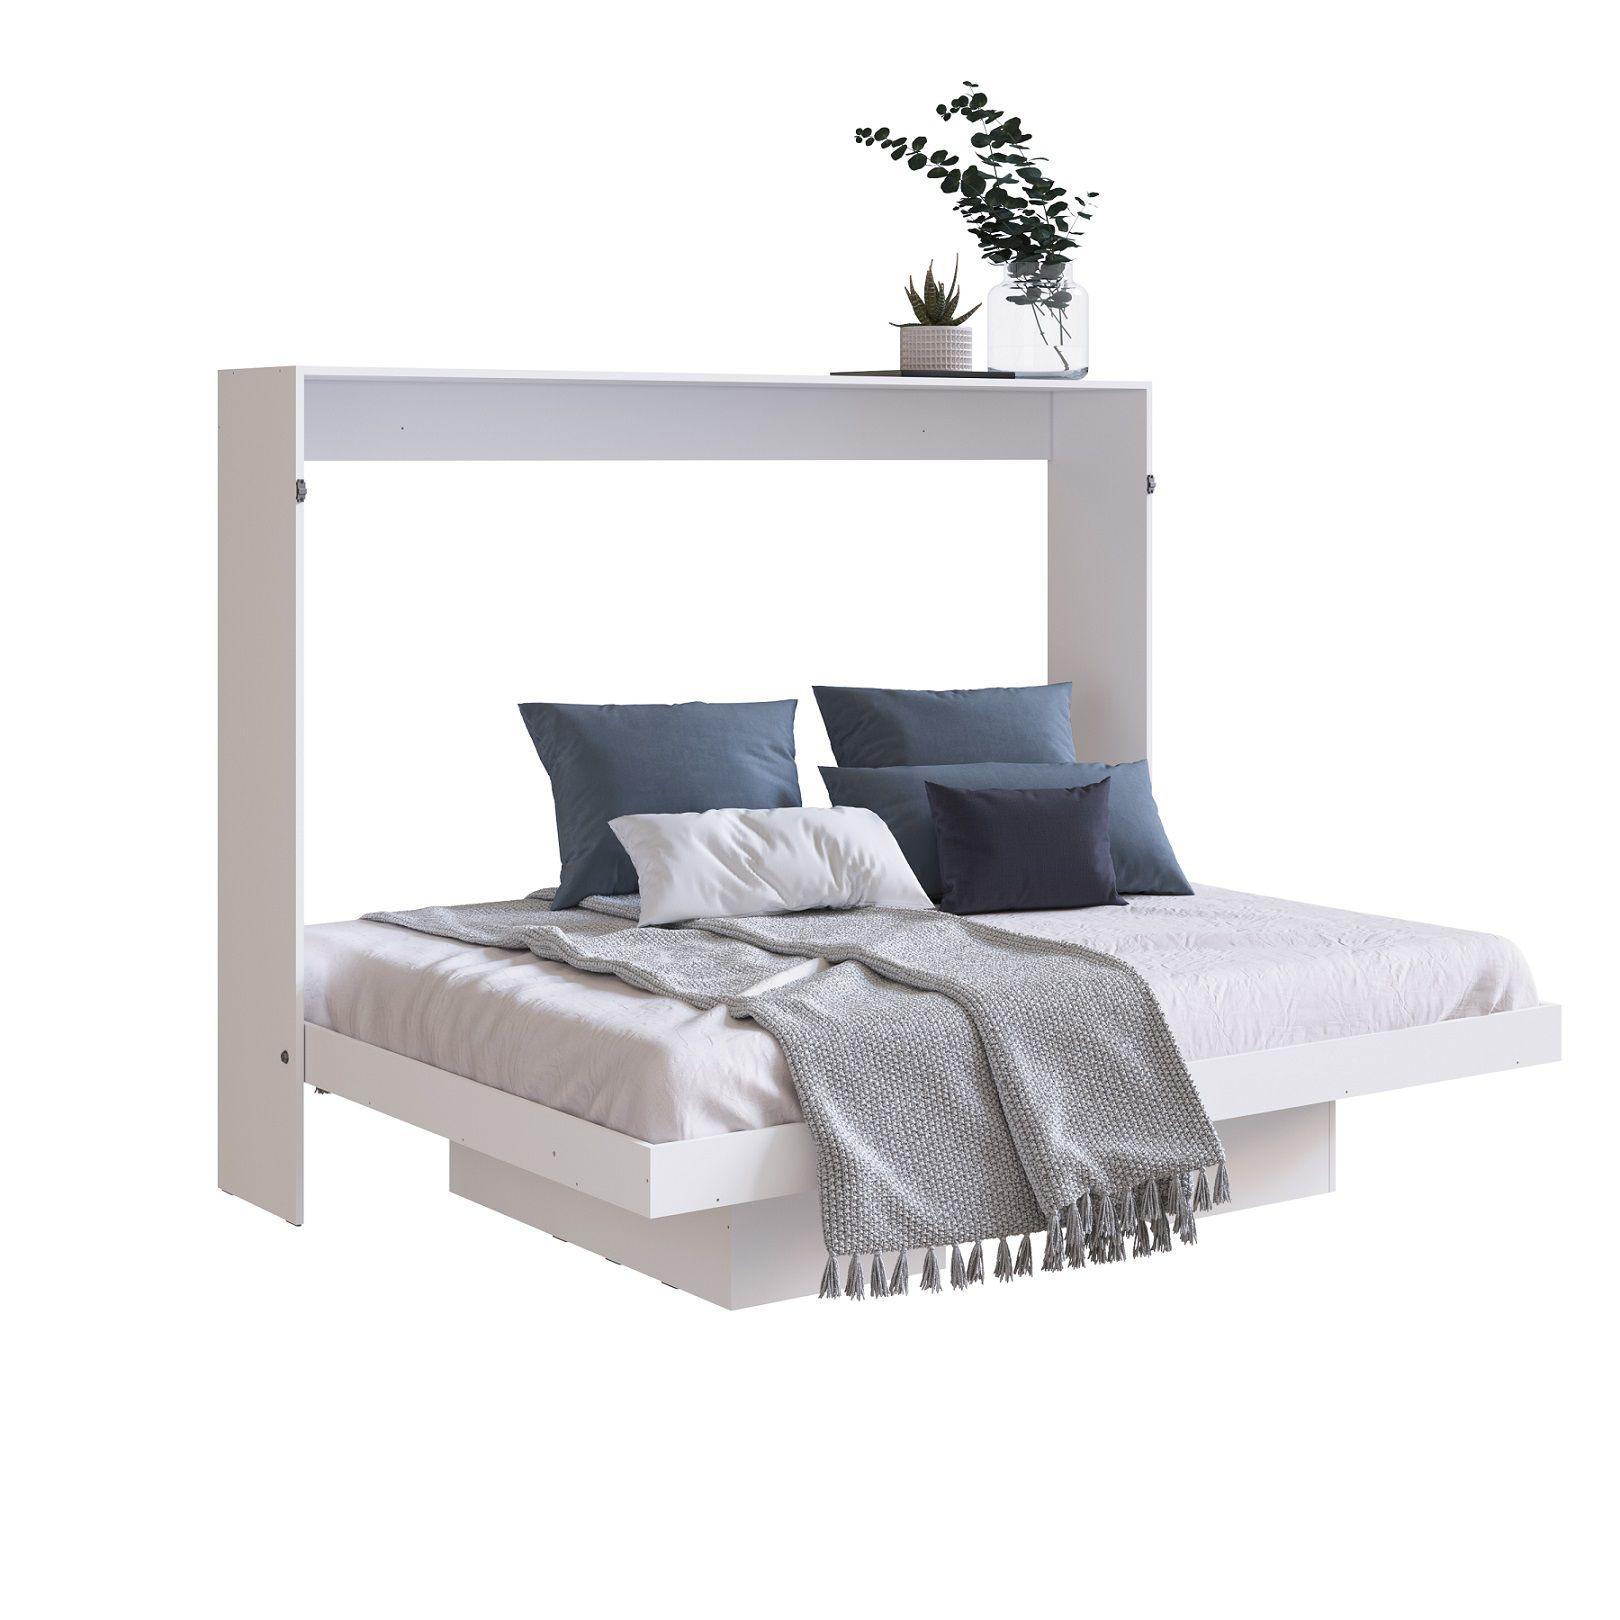 Cama Articulável Horizontal de Casal 140 Branco - Art in móveis